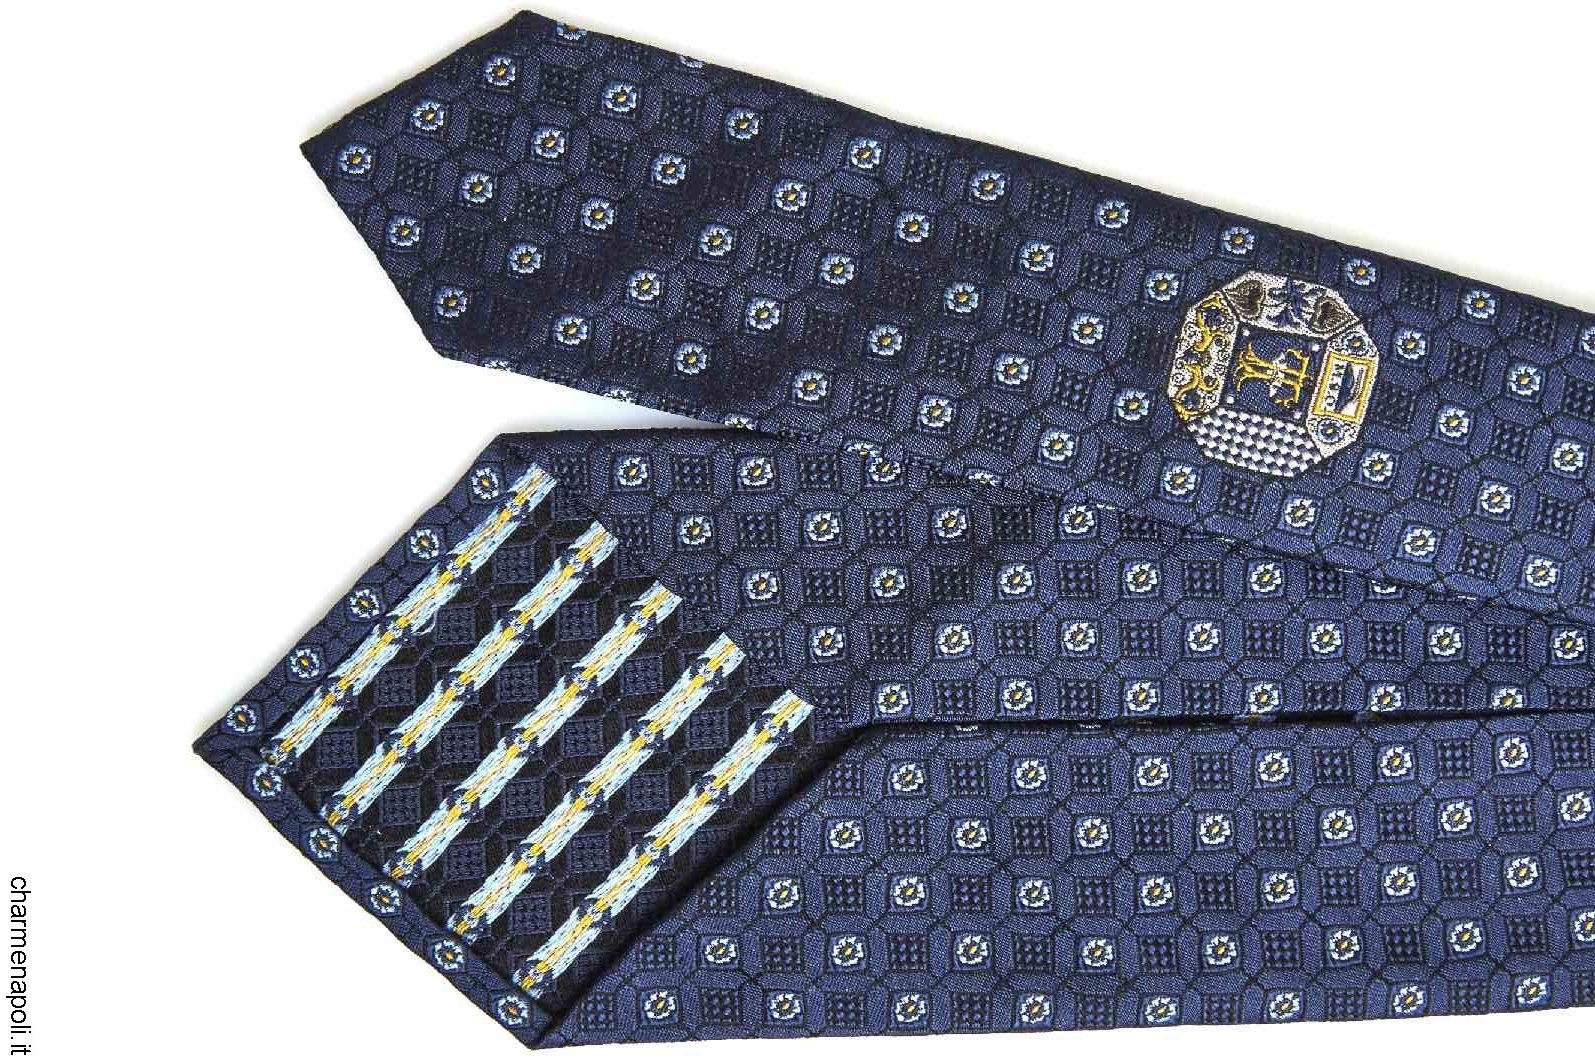 cravatte e foulard fatti a mano - Ugo Cilento